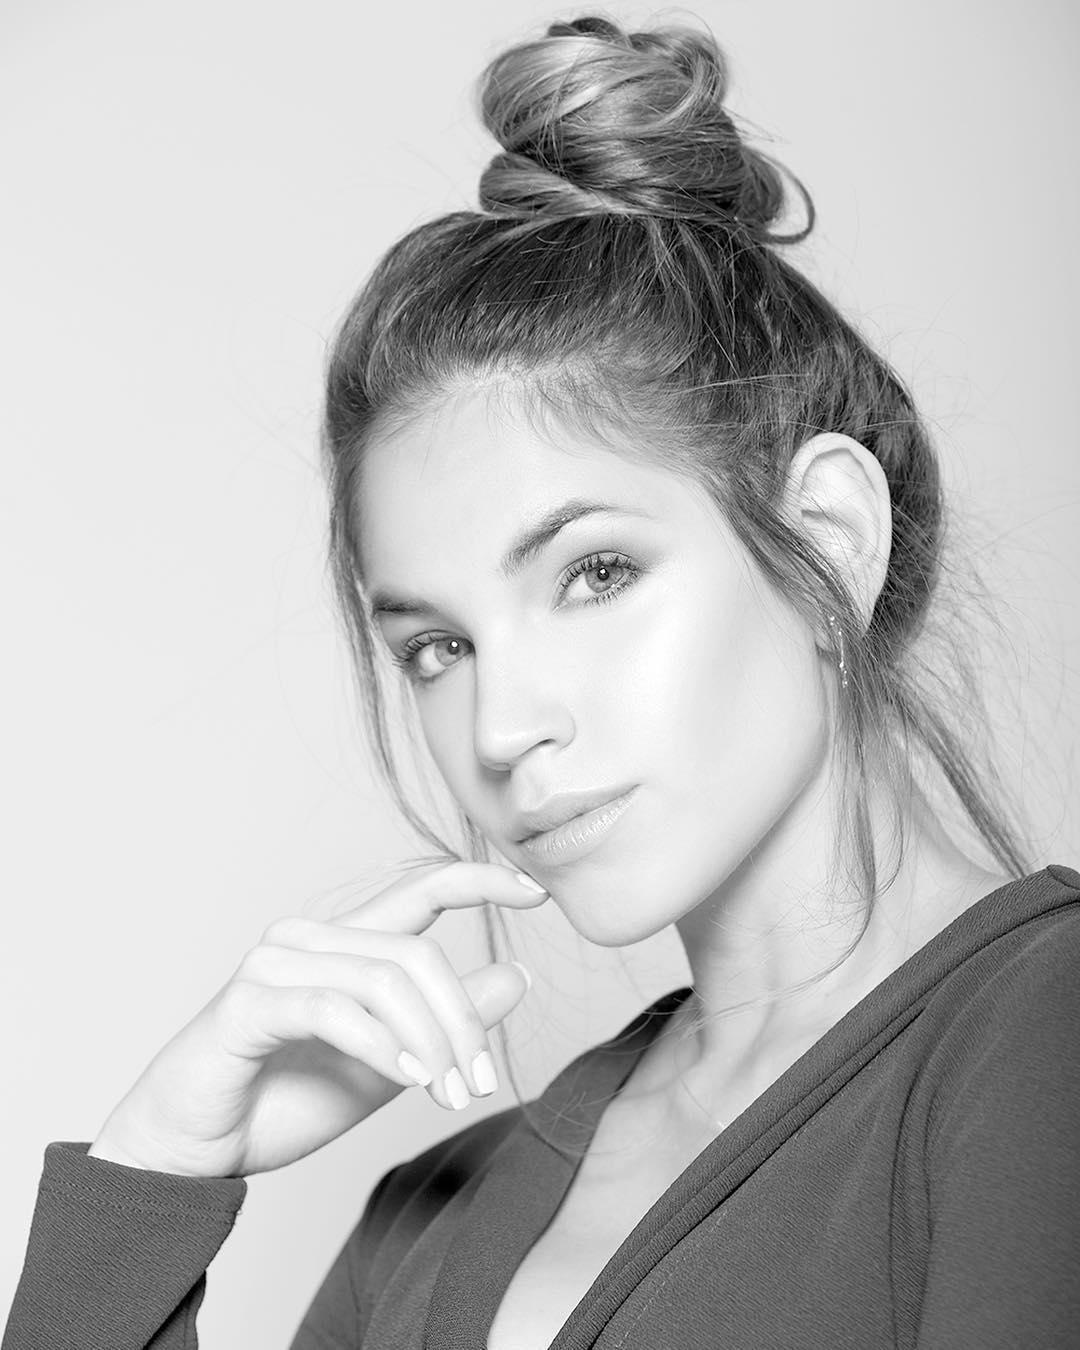 gina bitorzoli, miss intercontinental venezuela 2018-2019. N4x8ae10